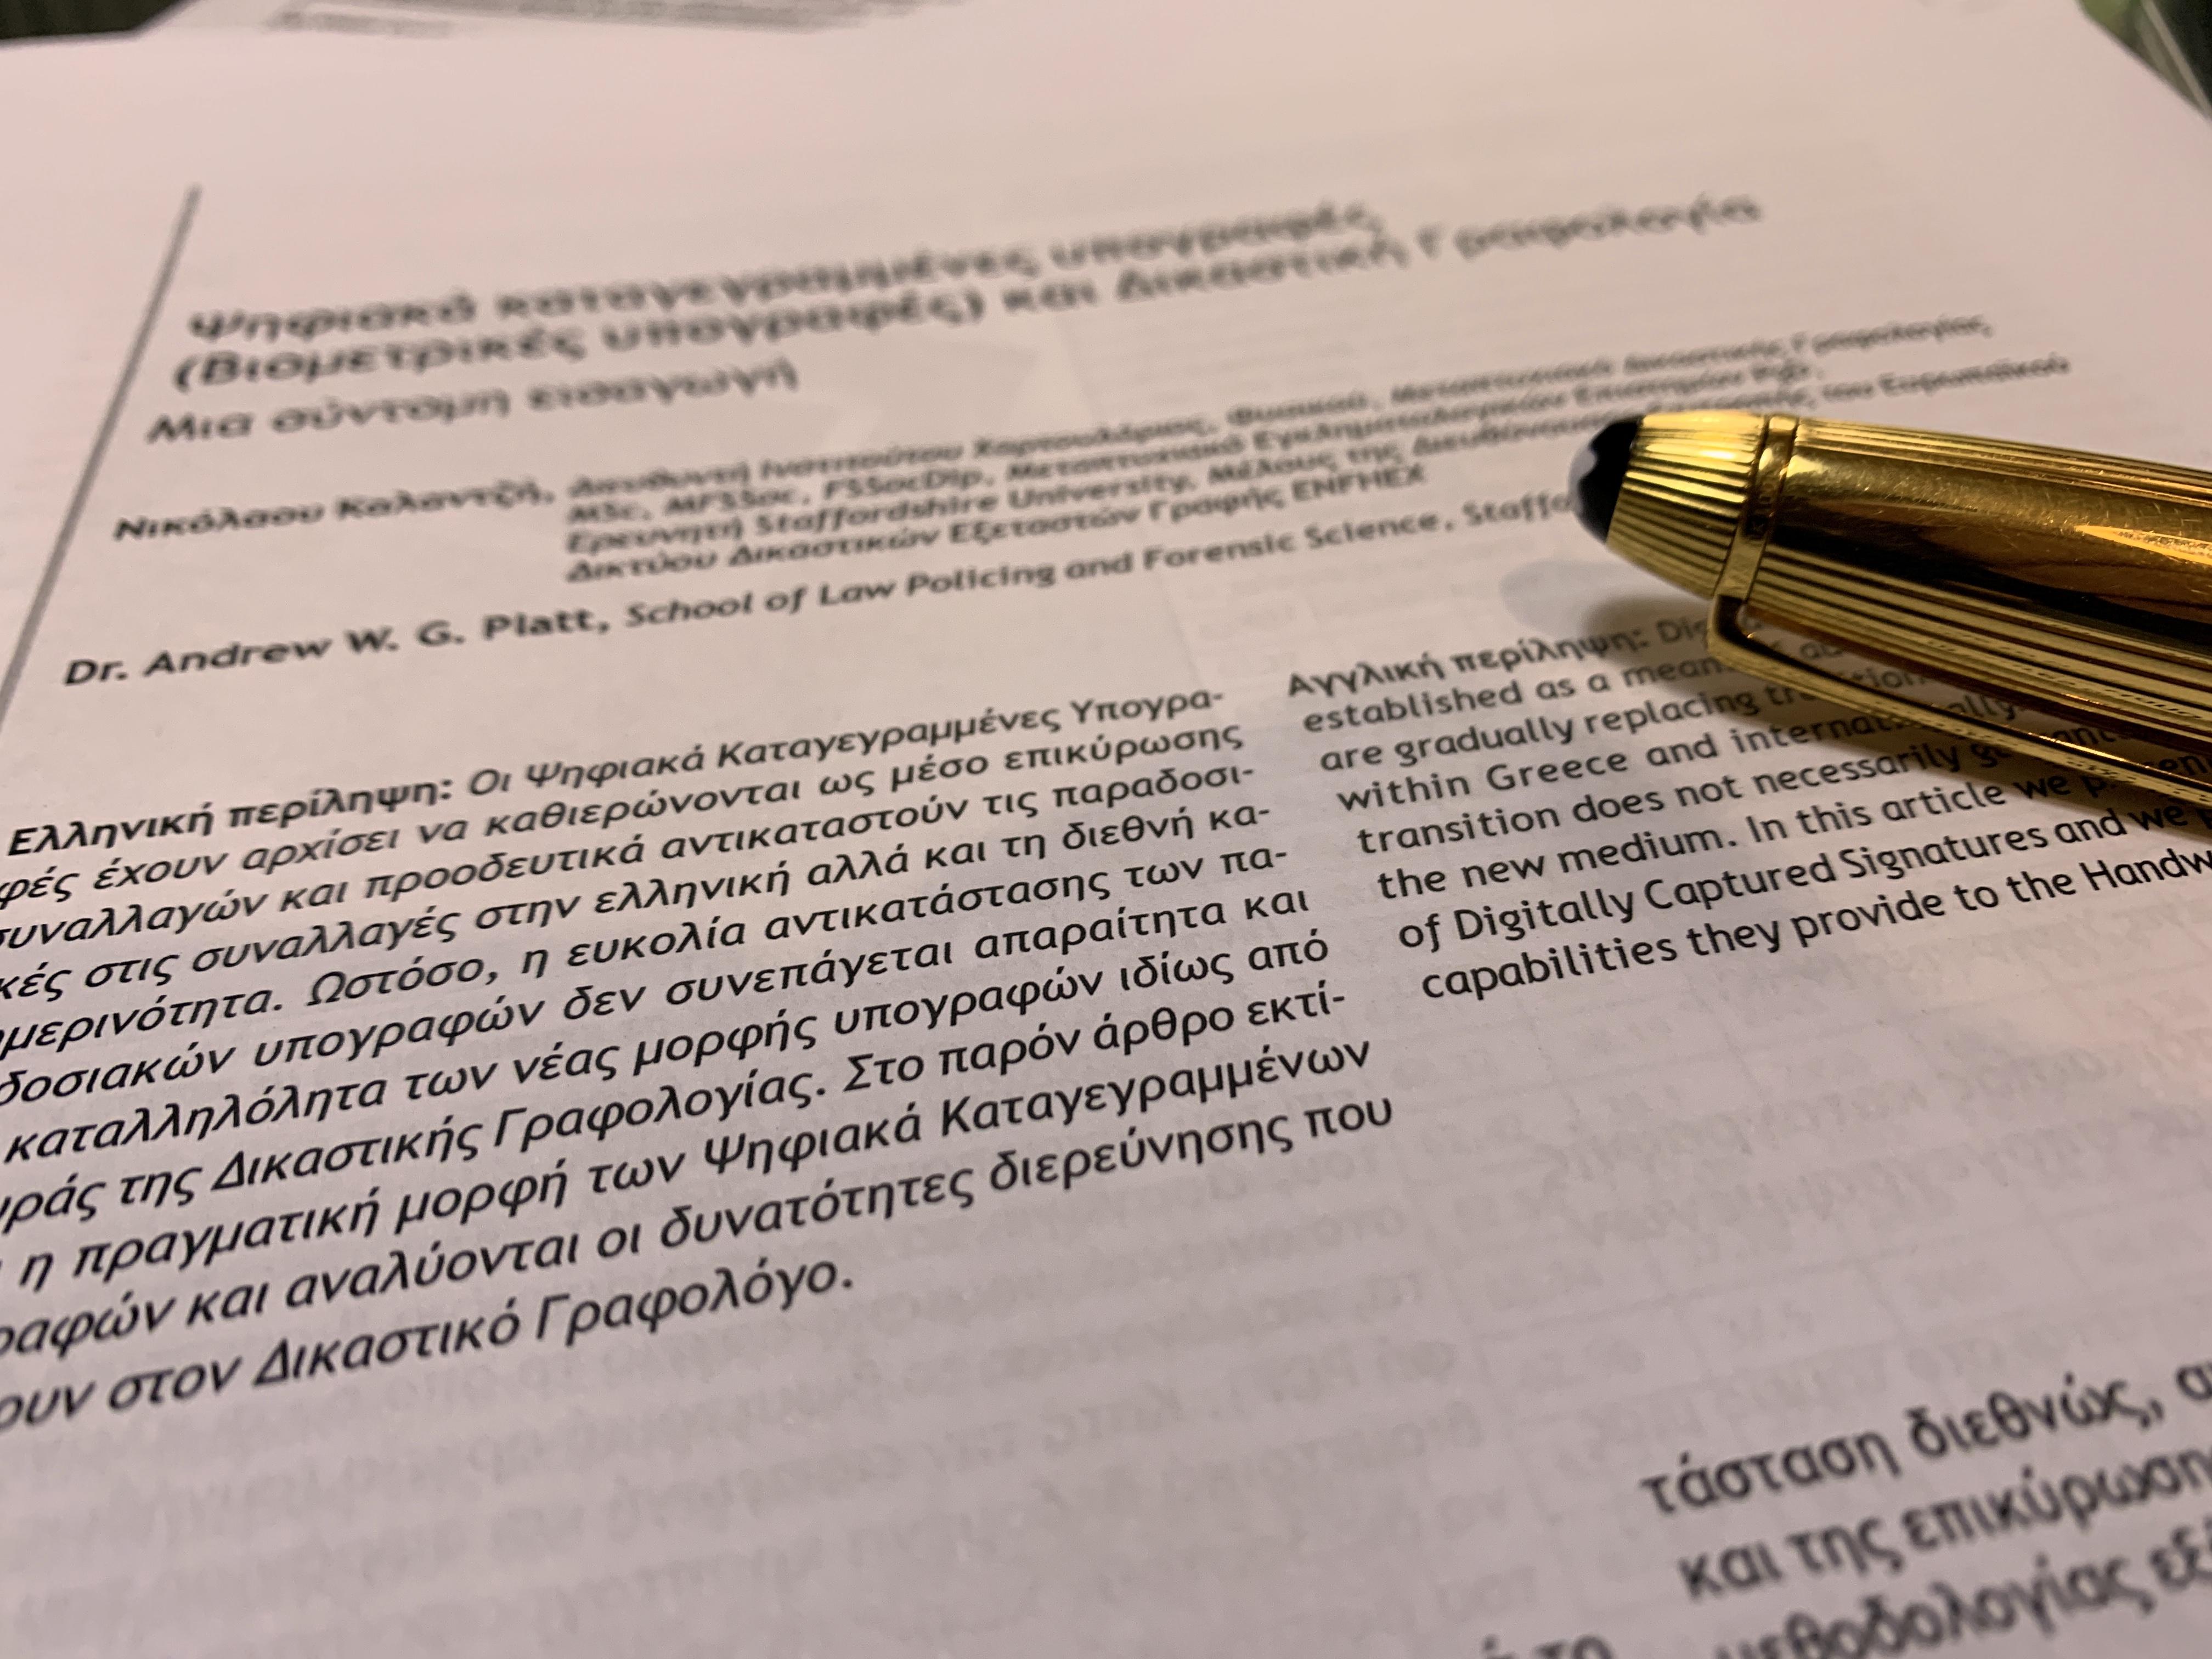 New Publication: Digitally Captured Signatures (Biometric Signatures) & Forensic Handwriting Examination. A short Introduction